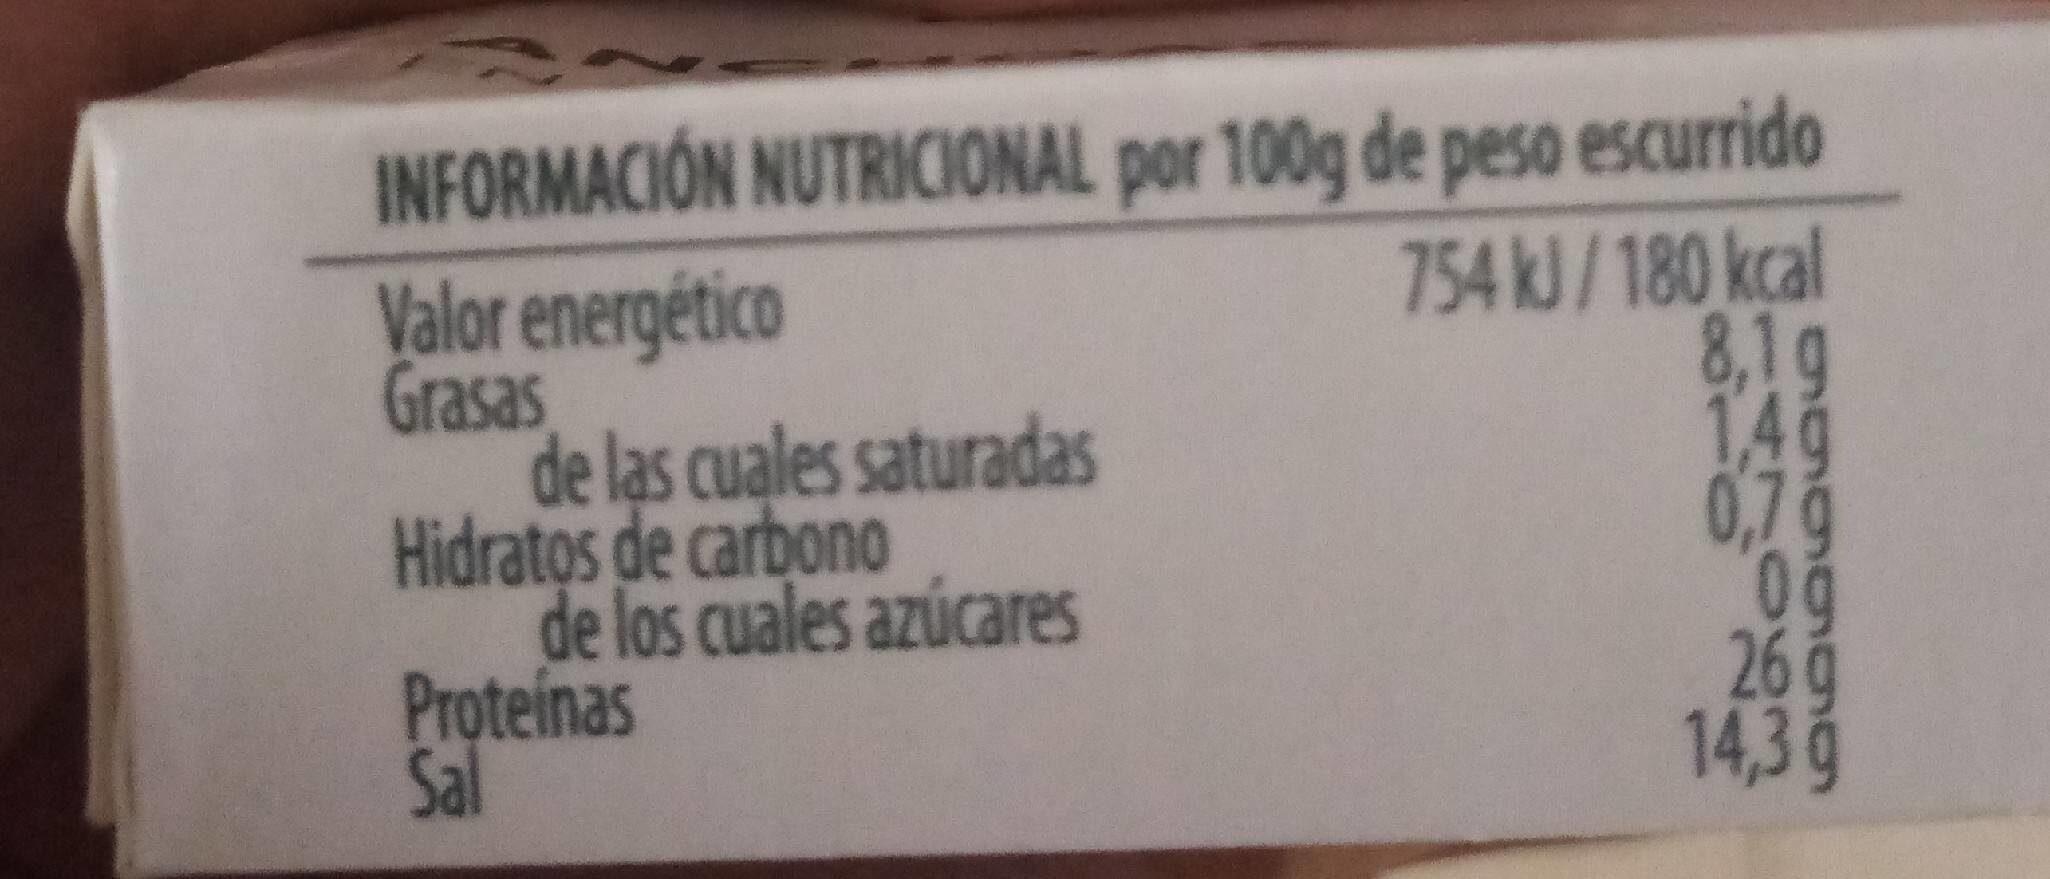 Anchoa En Aceite De girasol - Información nutricional - es